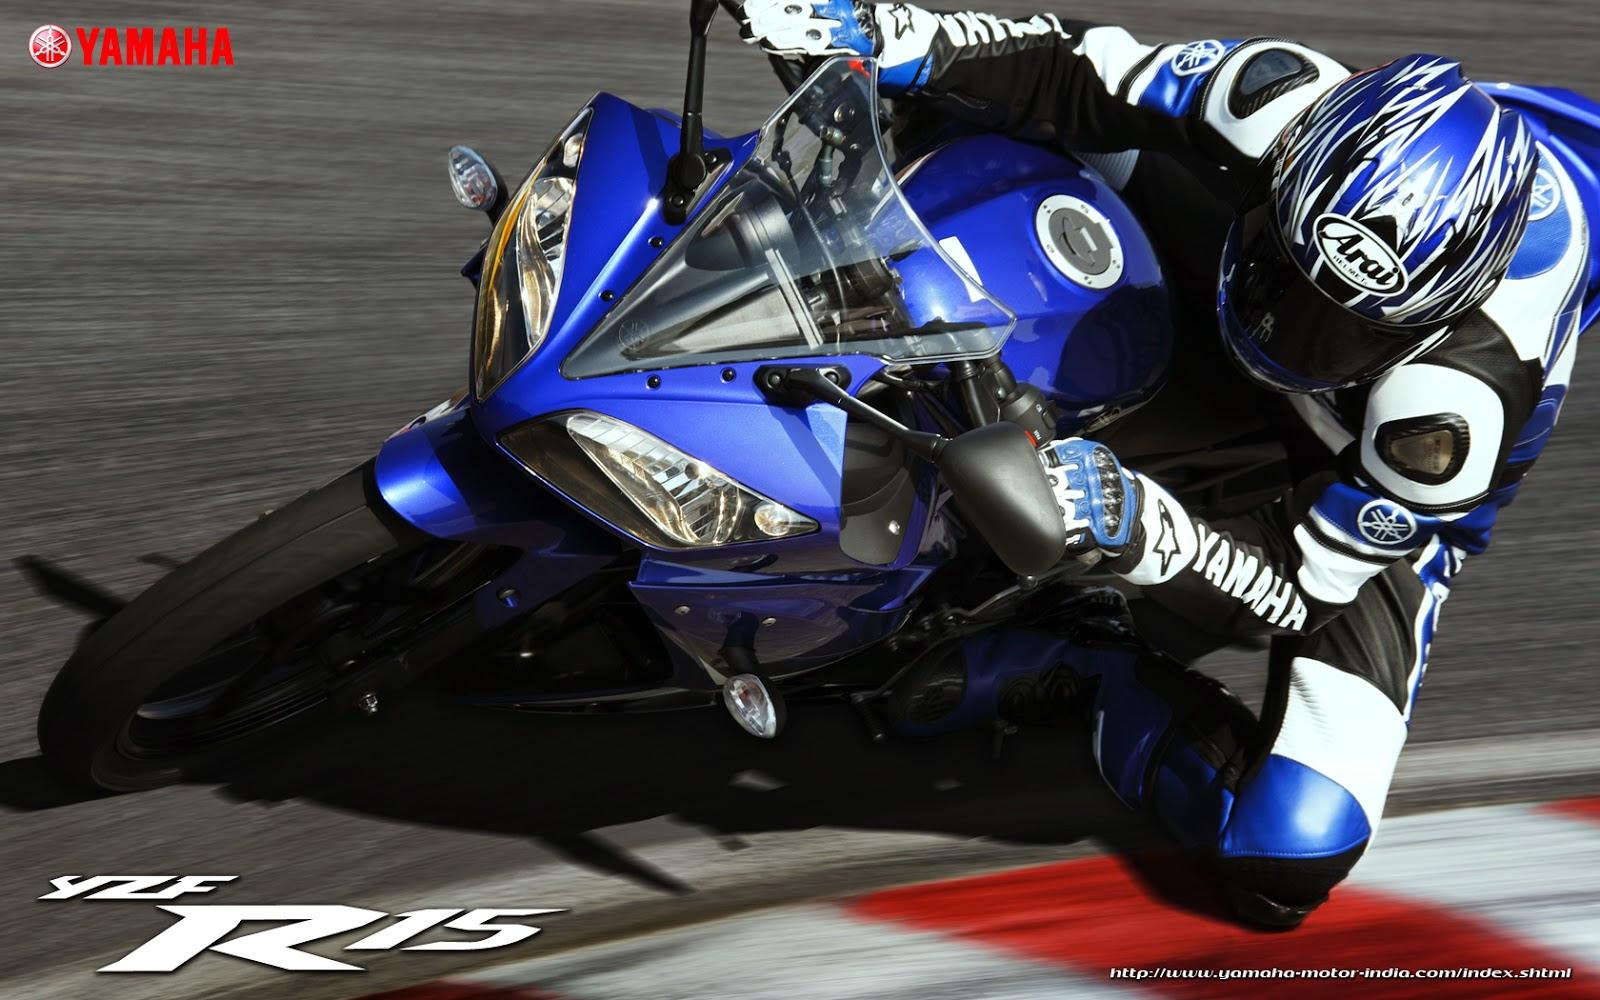 Kumpulan Gambar Motor Motor Yamaha R Cc